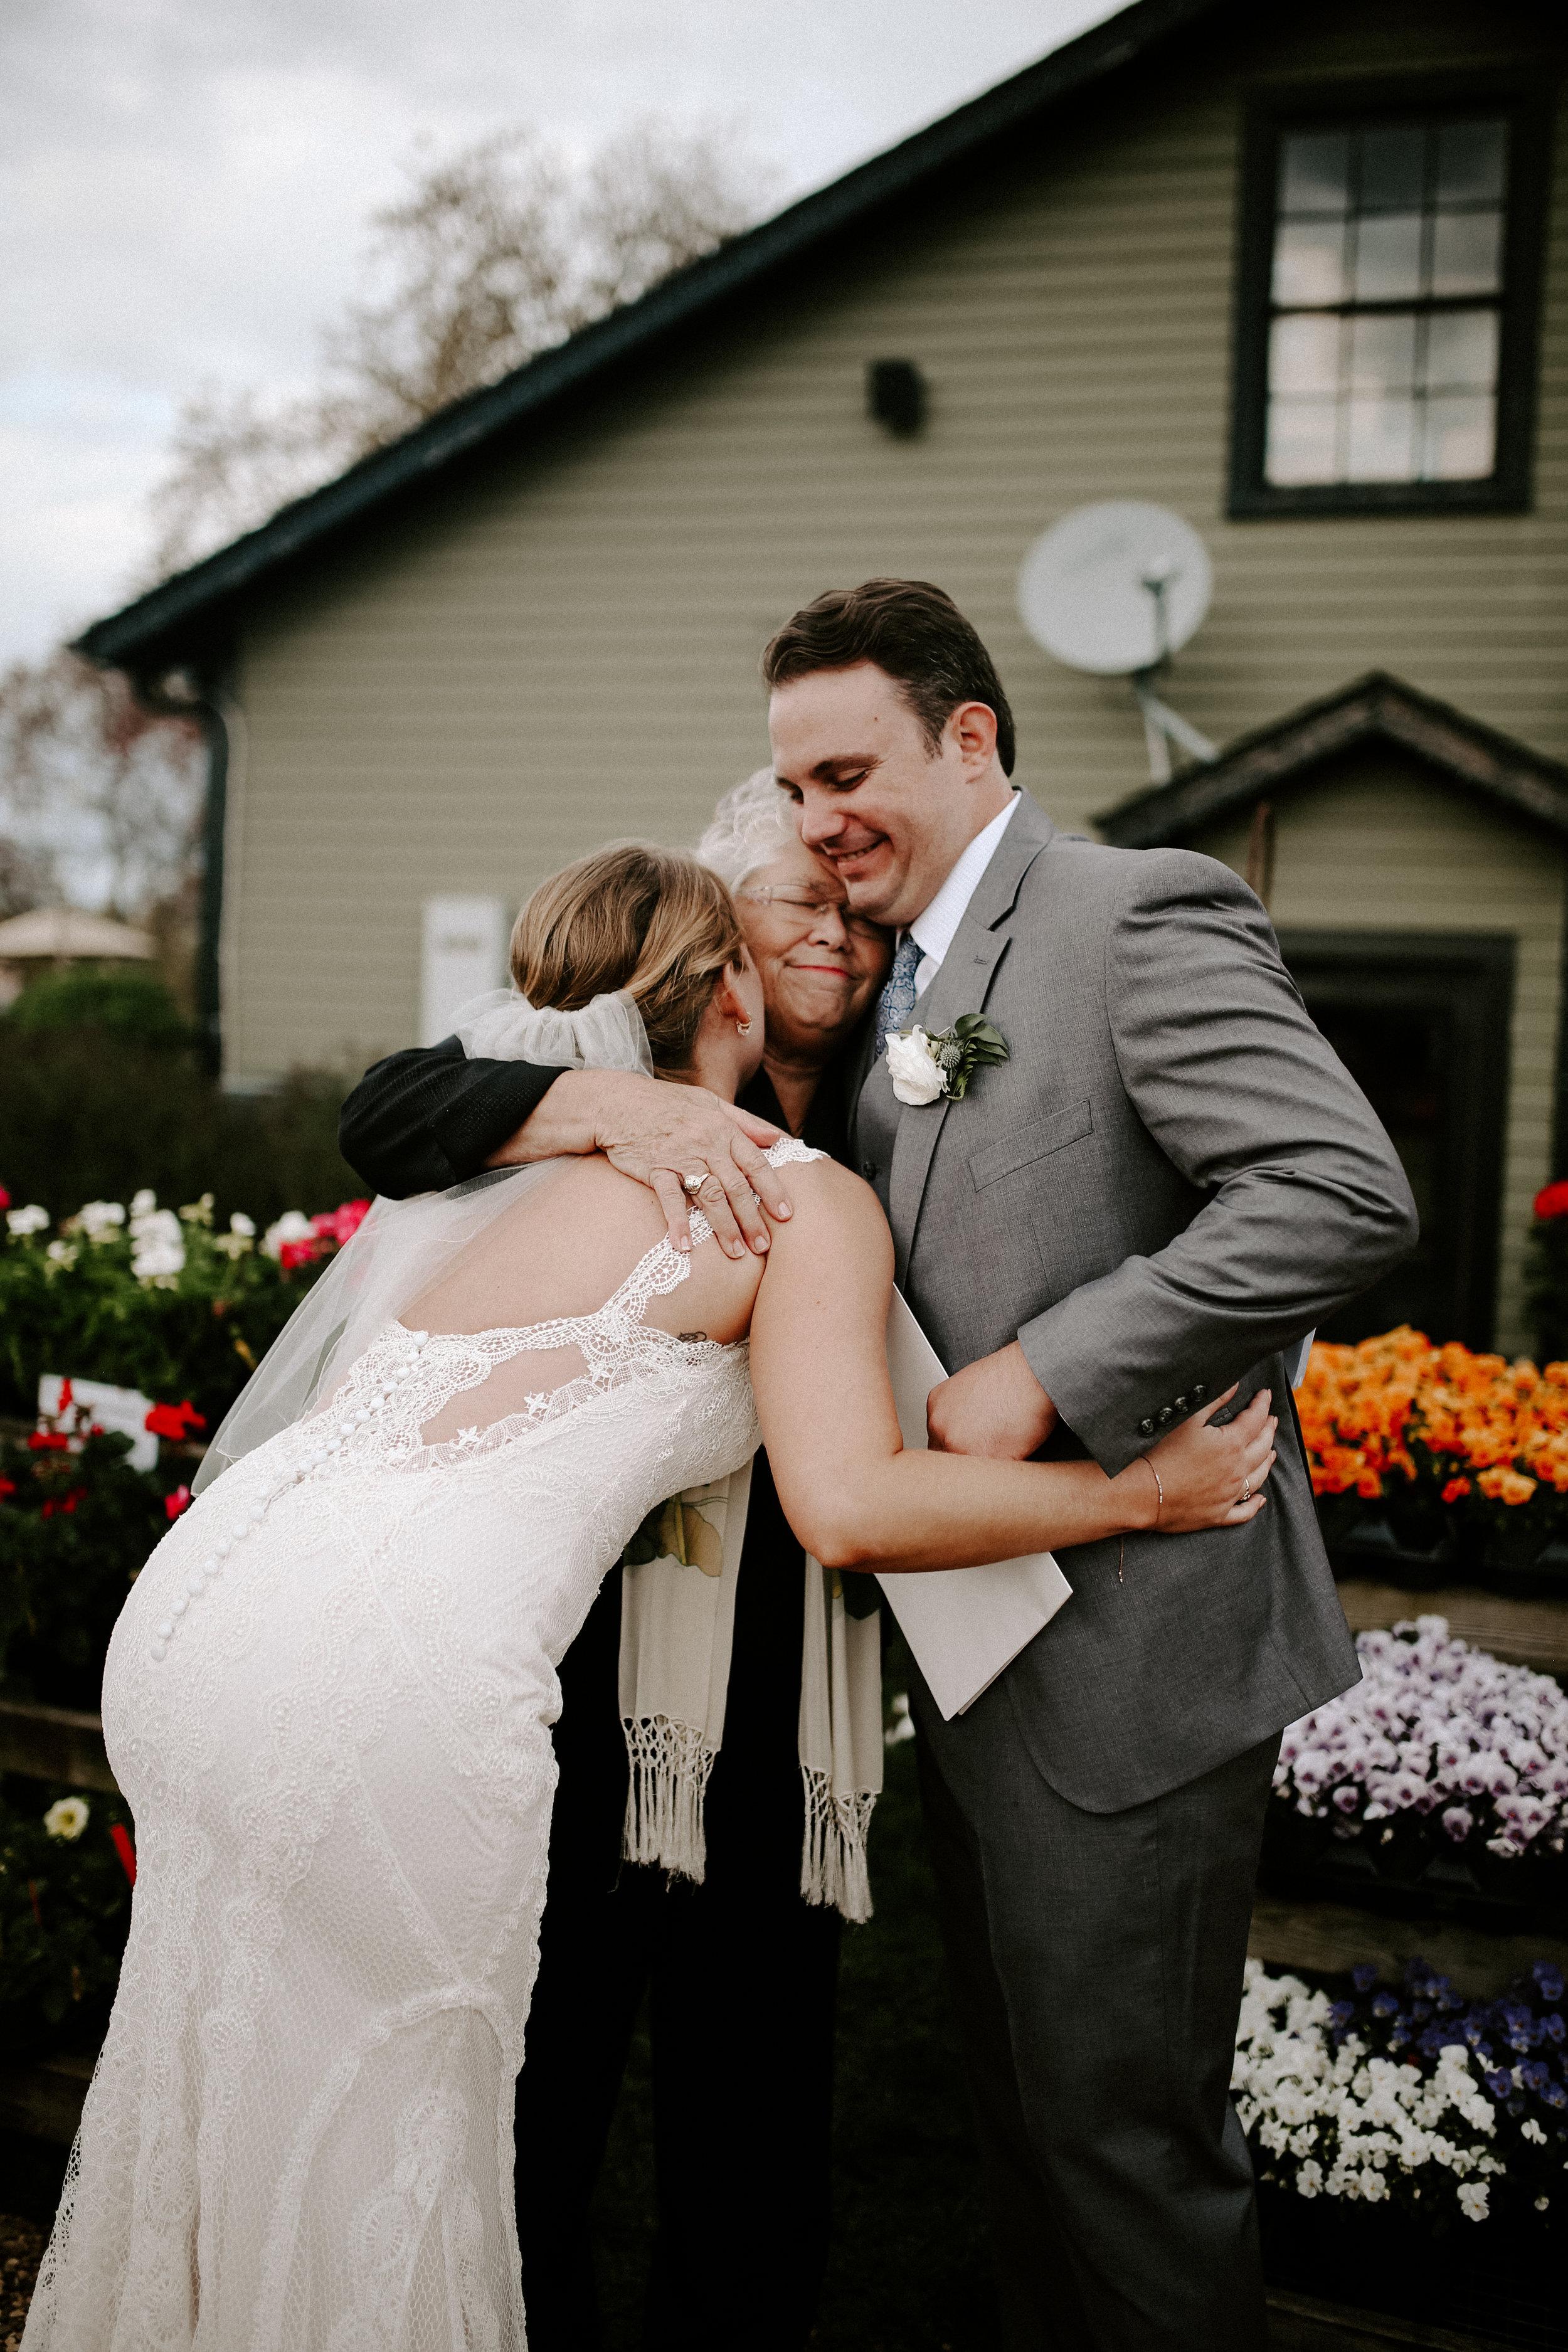 TheGreens_Married_2019-373.jpg